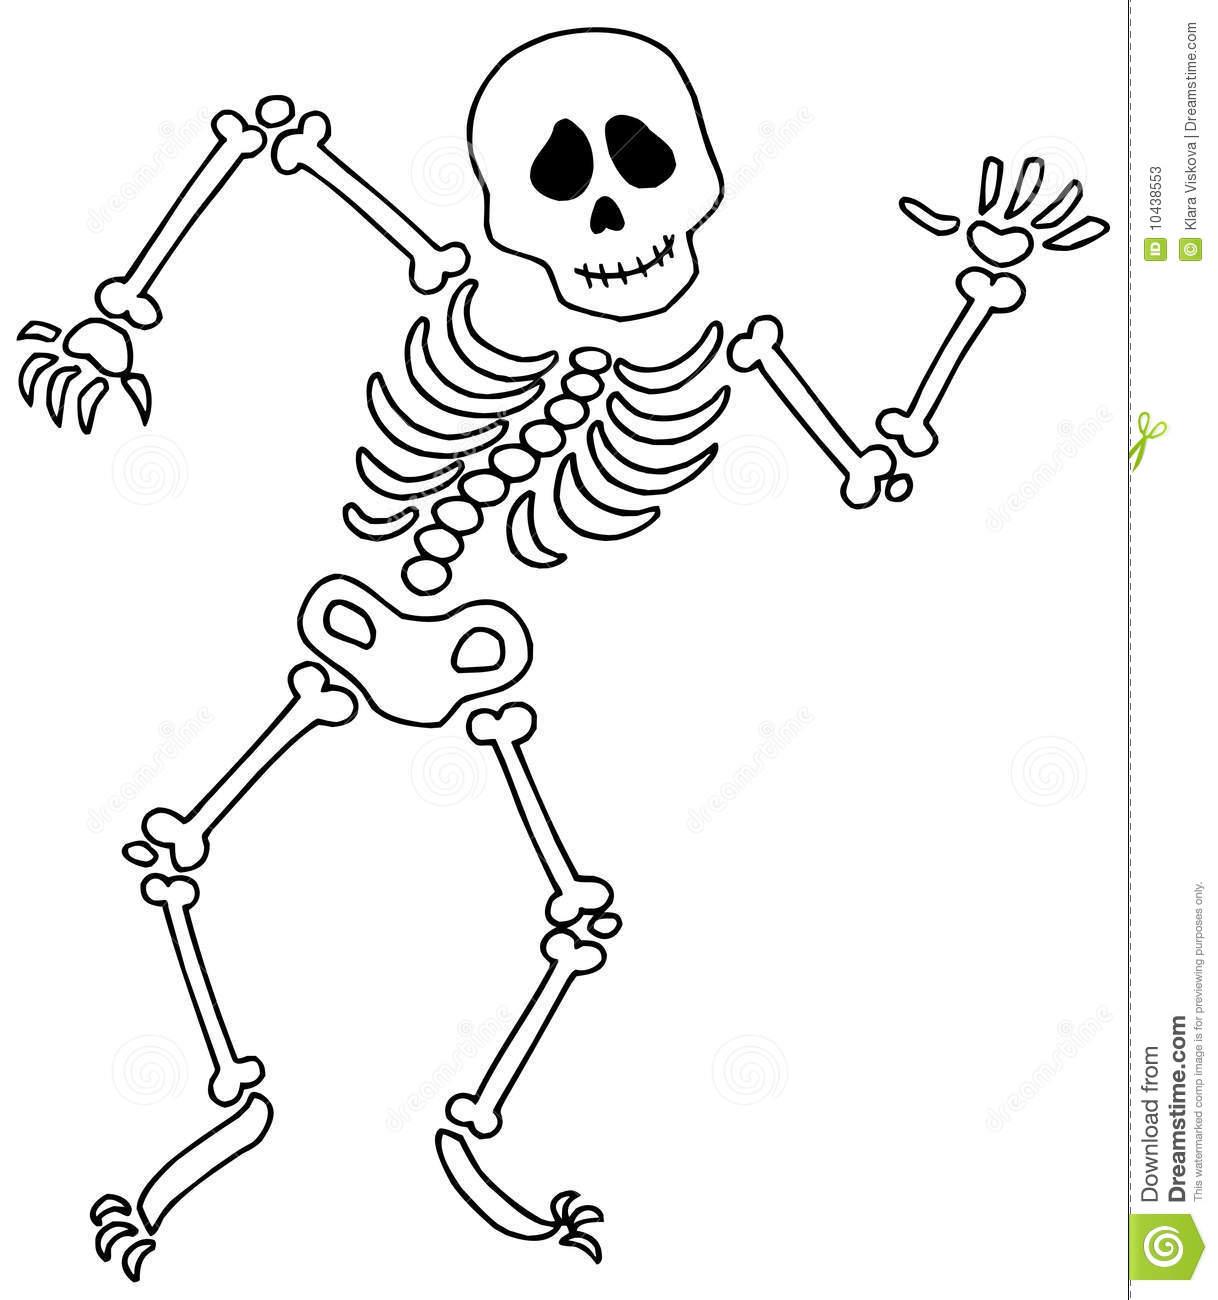 Skeleton Clip Art Images Stock Photos Amp Clipart